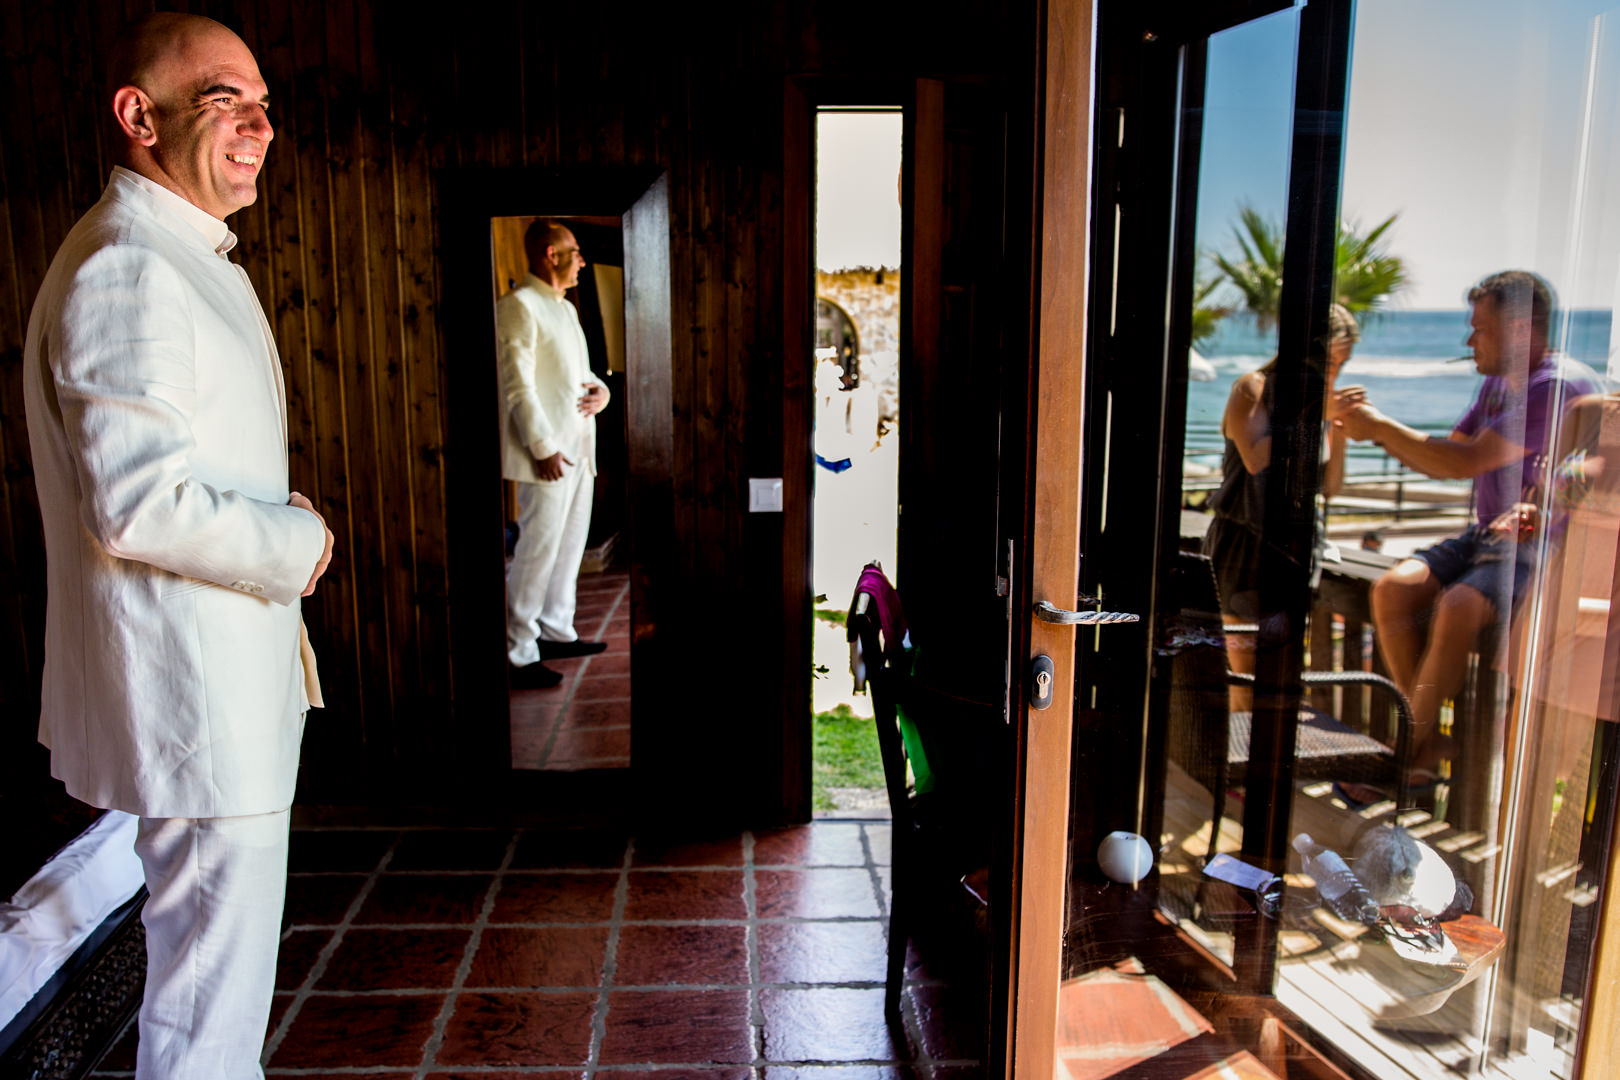 Boda-Sajorami-Beach-Cadiz-Zahora-Pedro-Gema-engagement-Rafael-Torres-fotografo-bodas-sevilla-madrid-barcelona-wedding-photographer--12.jpg